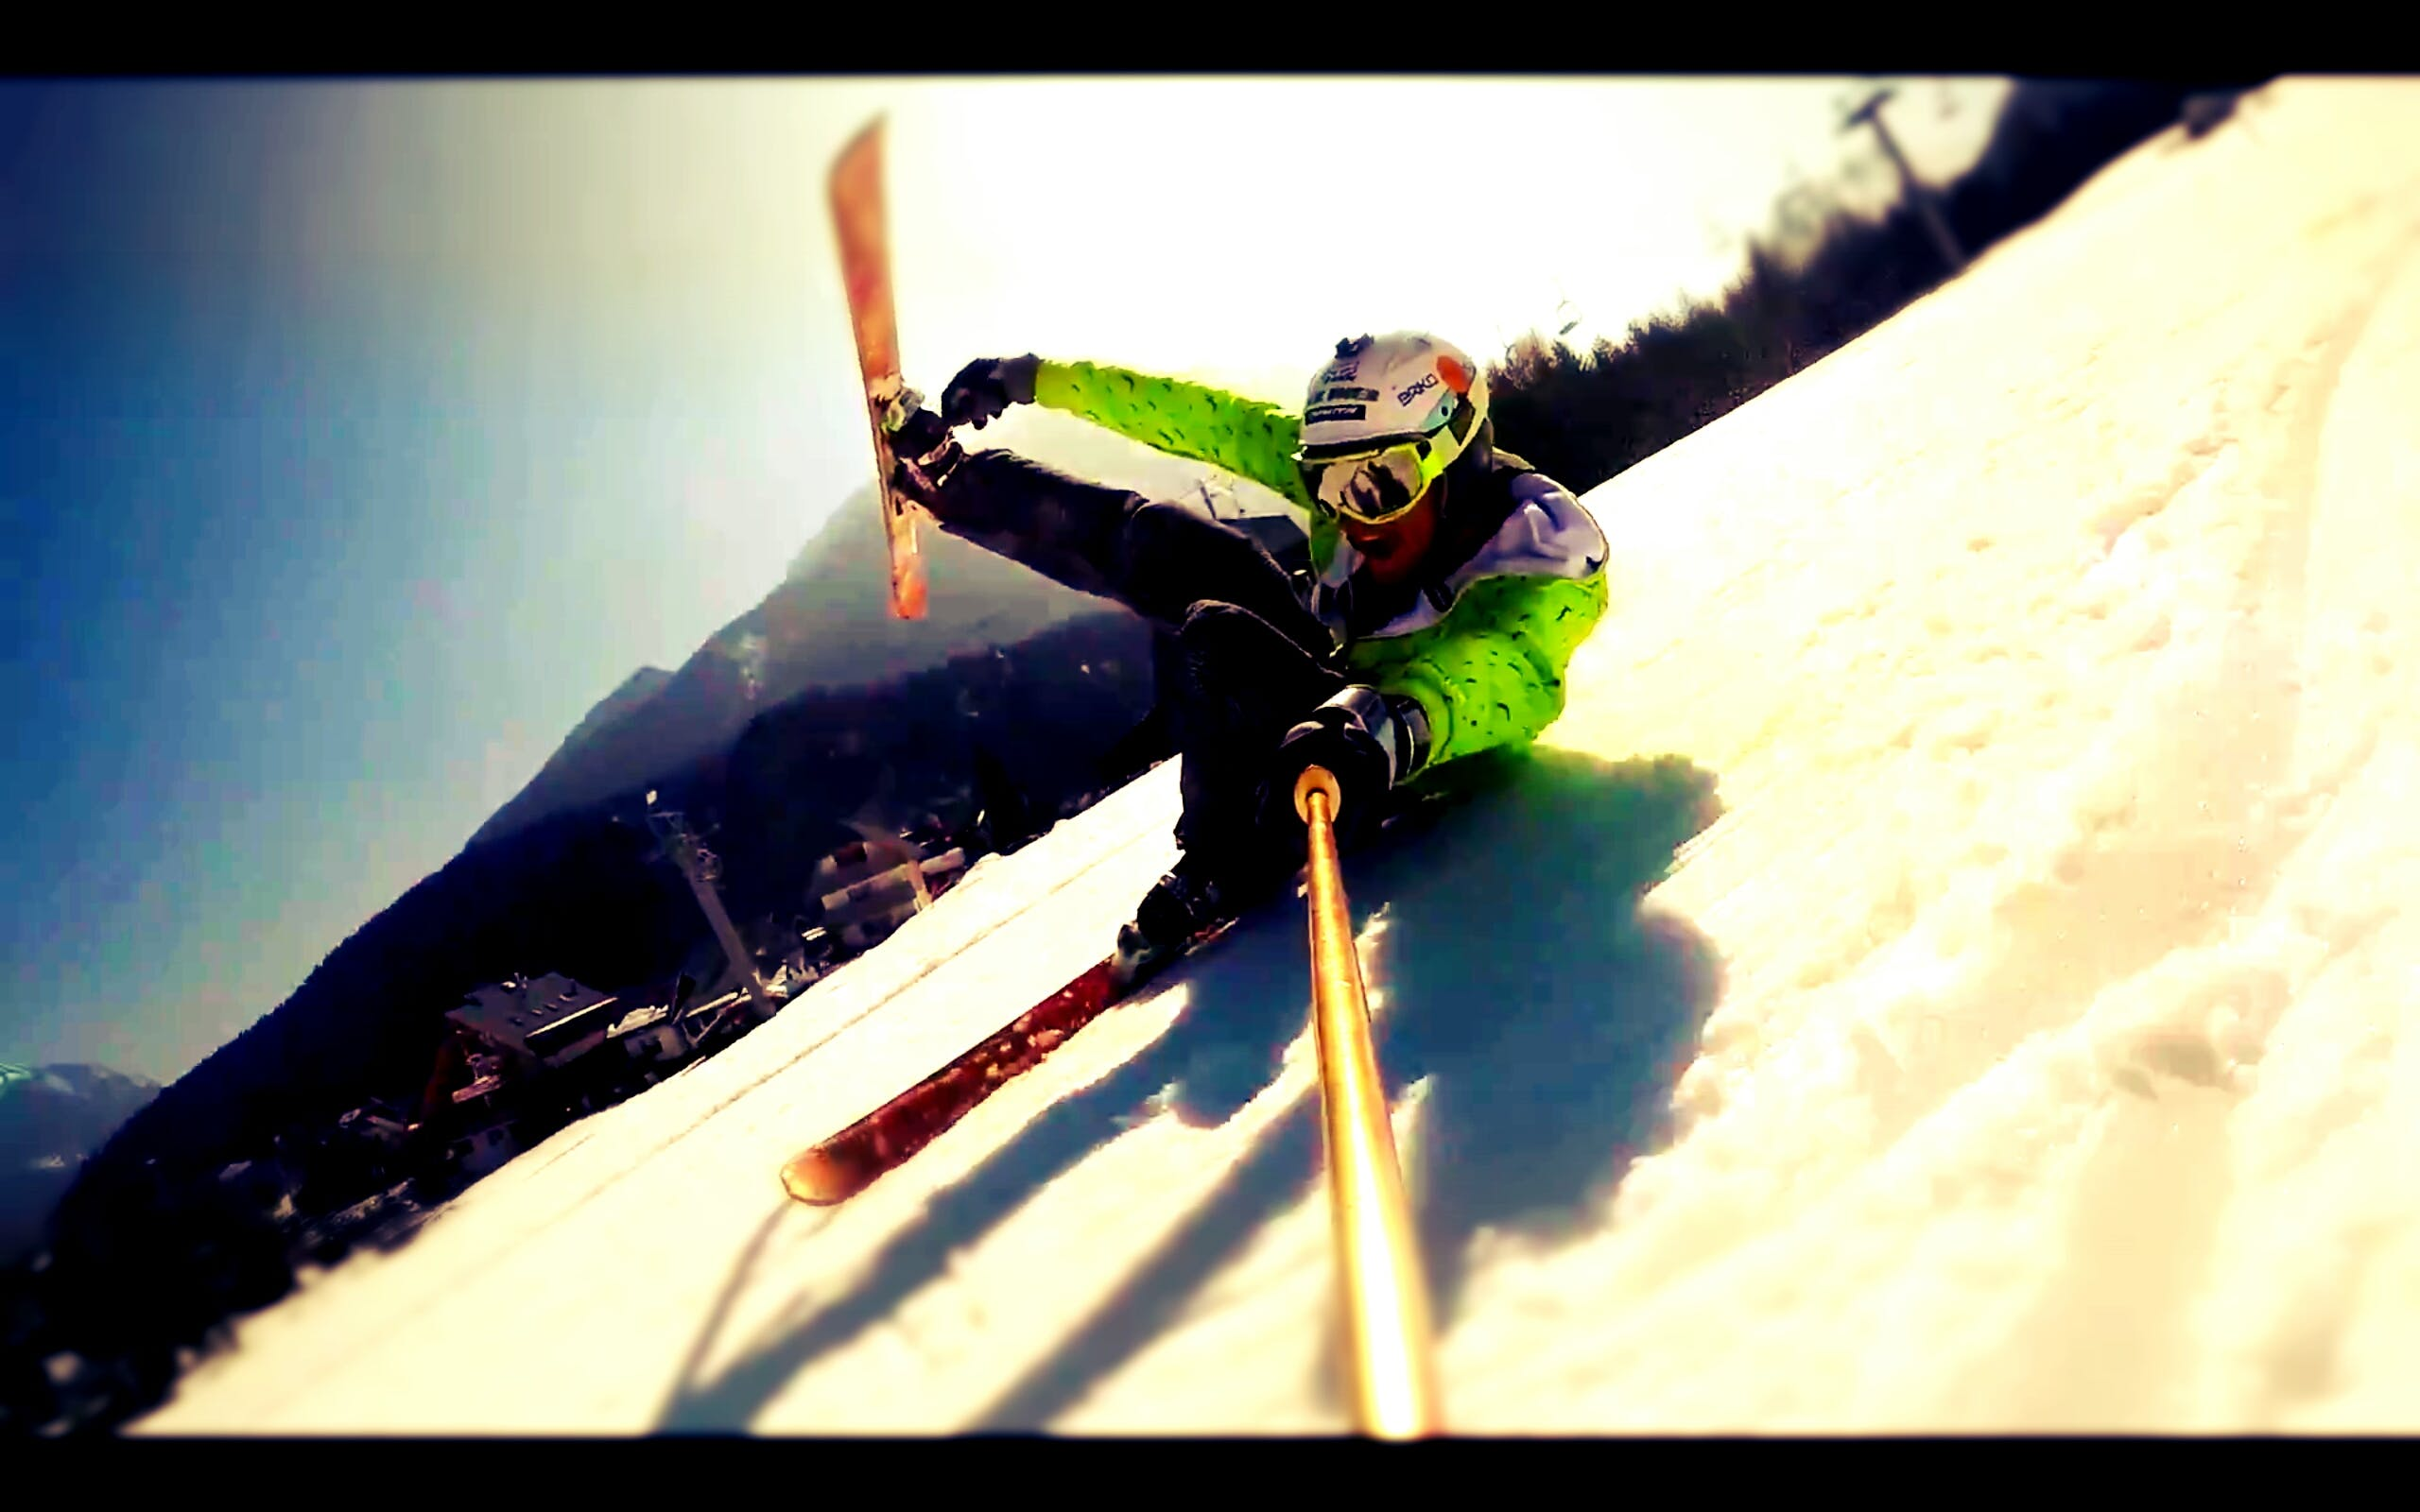 Free stock photo of skiing